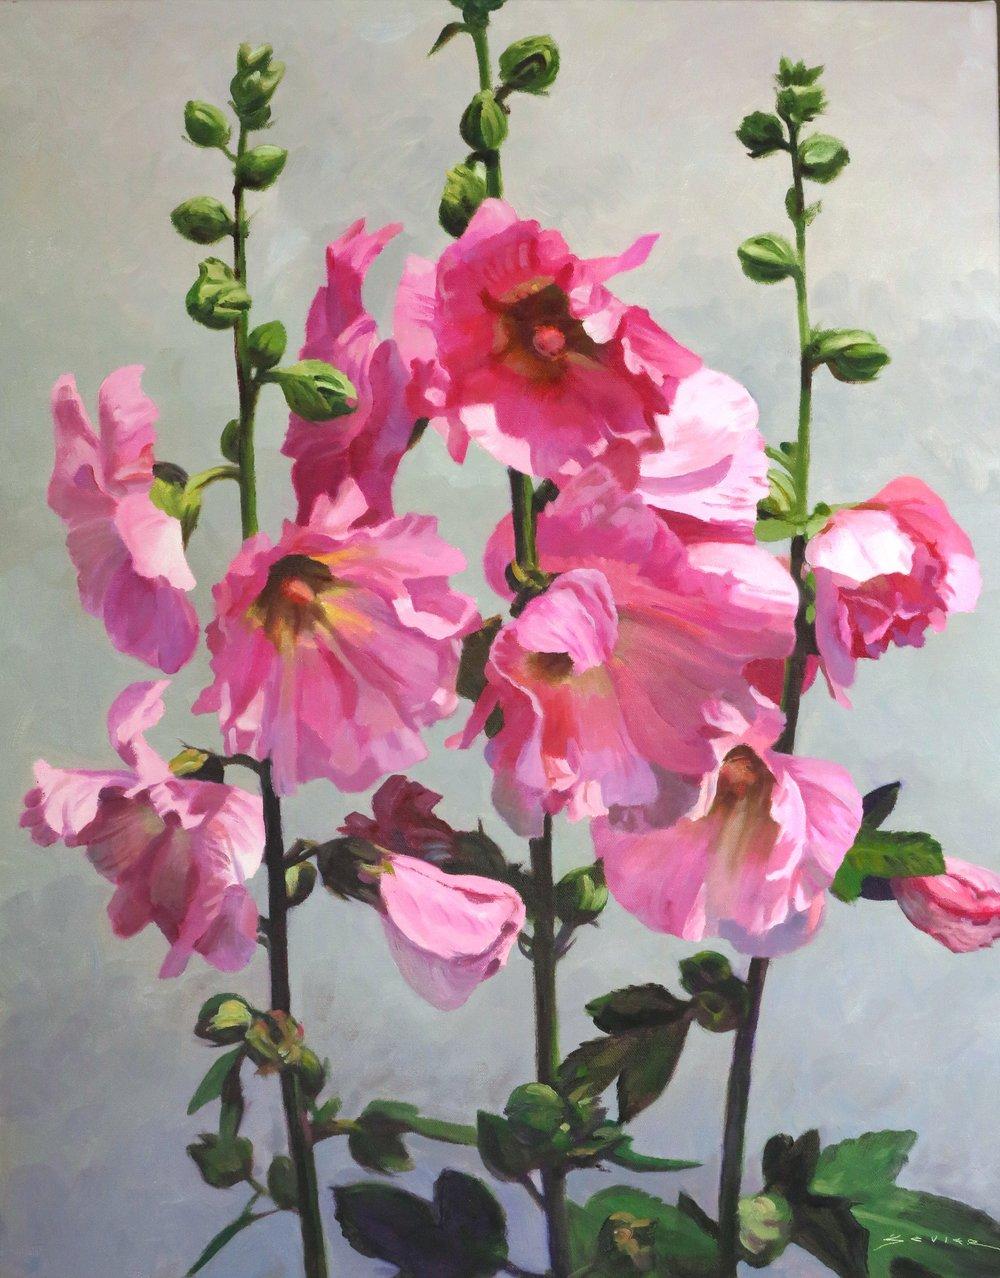 Pink Hollyhocks on a Light Background,  28 x 22, oil